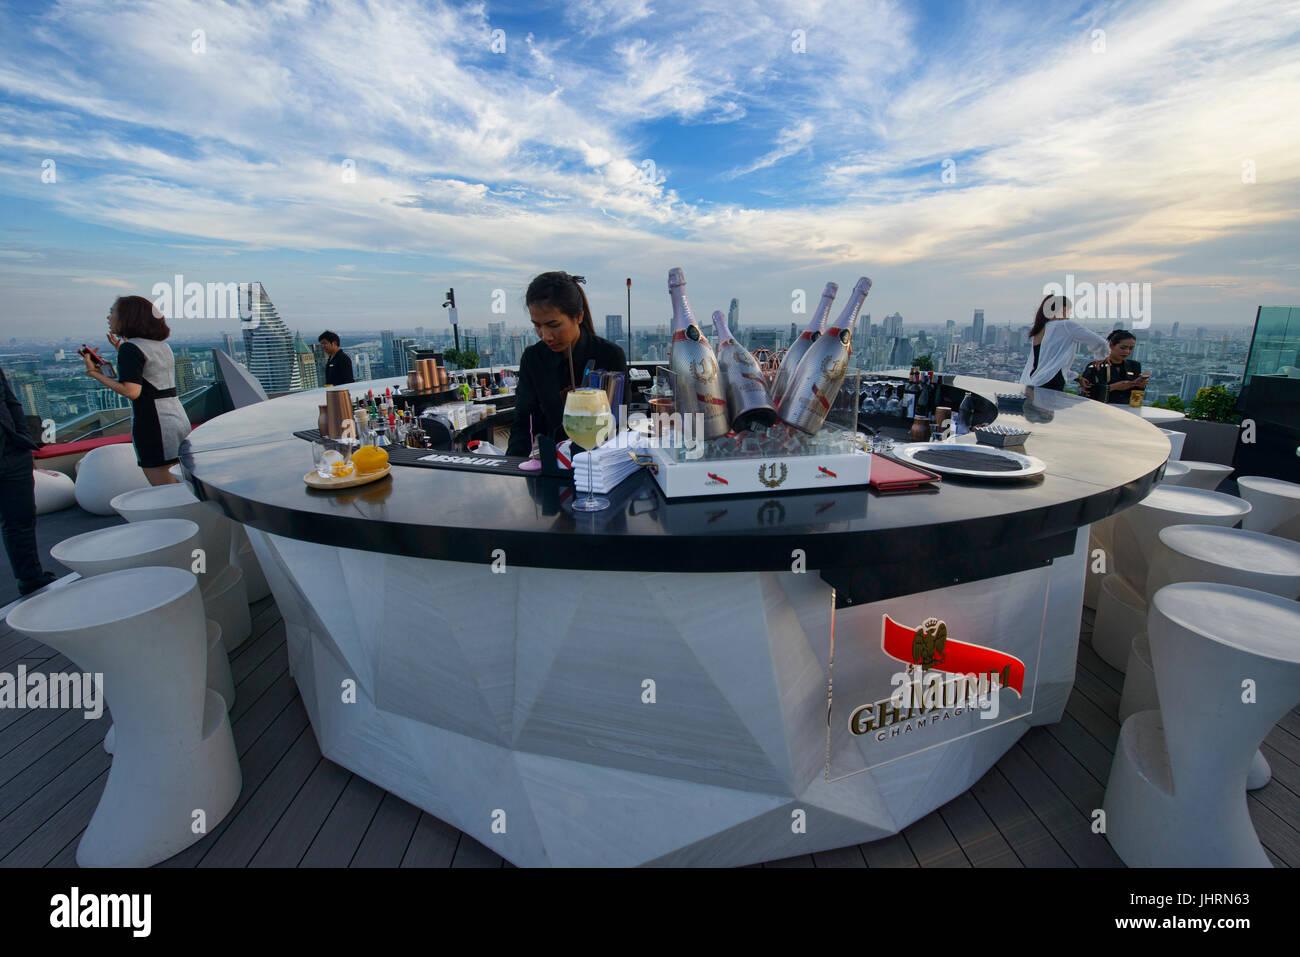 Enjoying sunset at a rooftop bar, Bangkok, Thailand - Stock Image